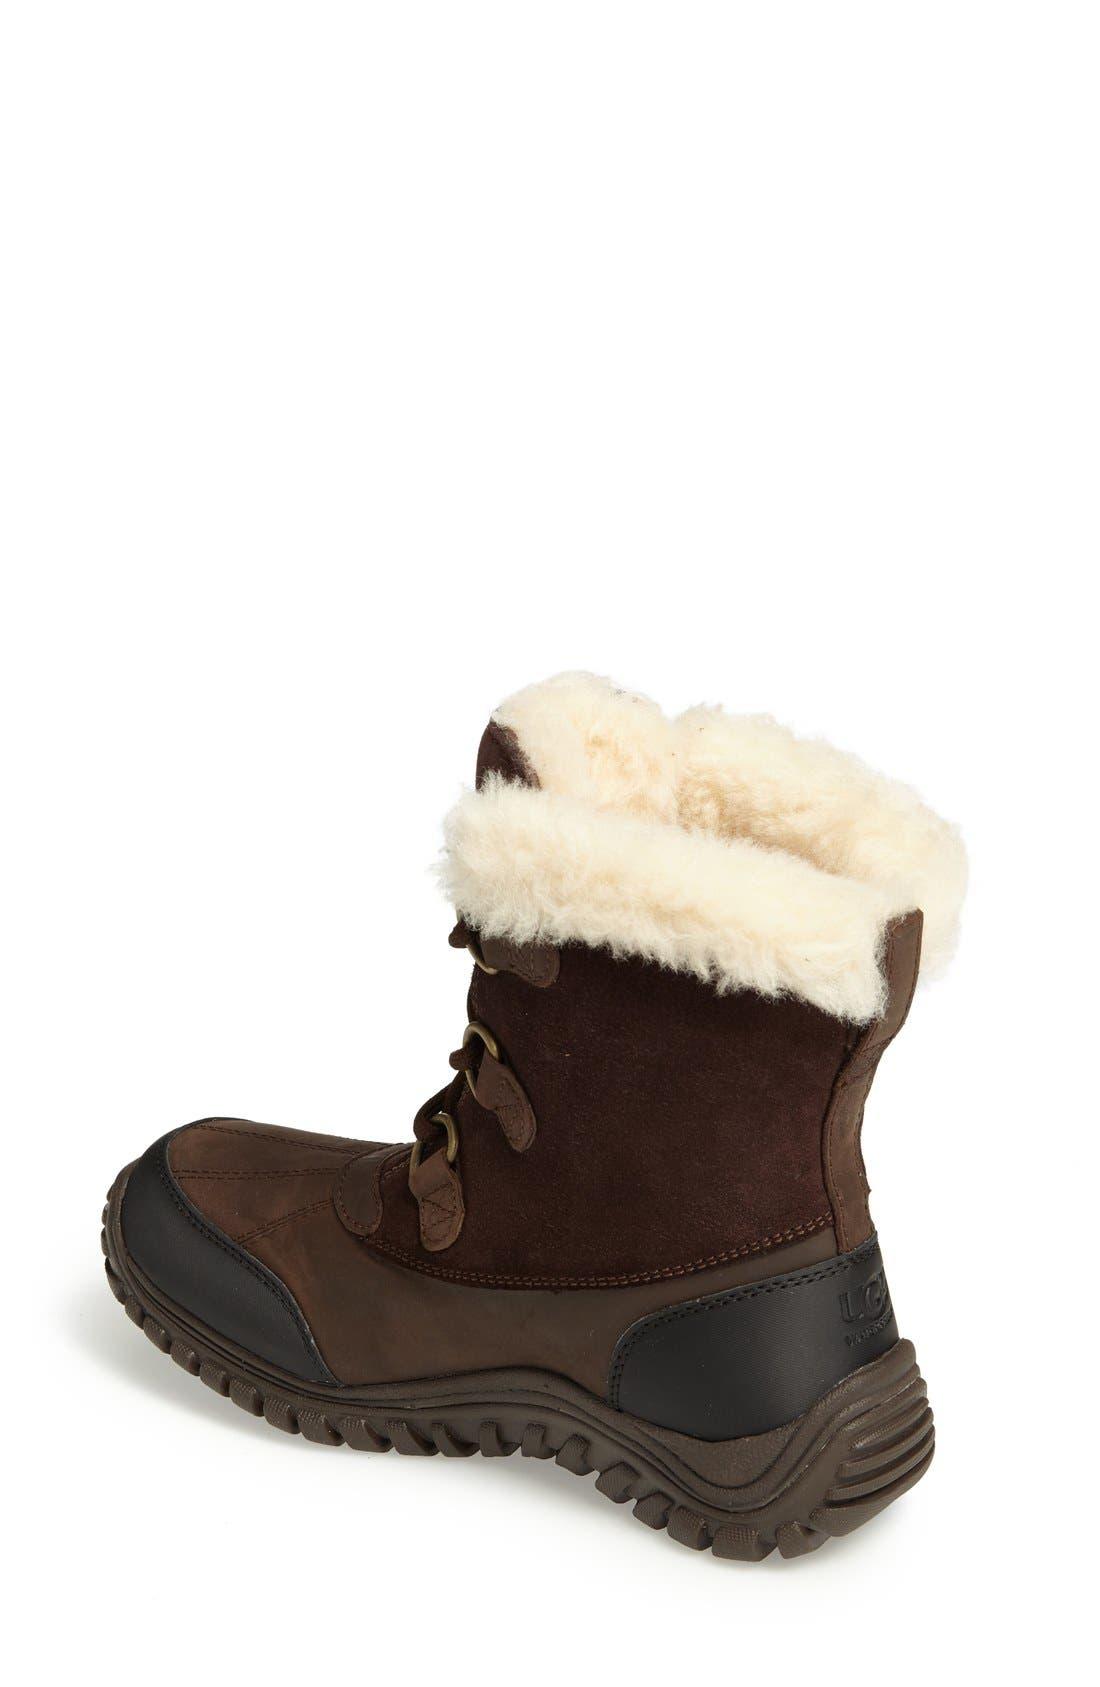 Alternate Image 2  - UGG® Ostrander Waterproof Winter Boot (Women)